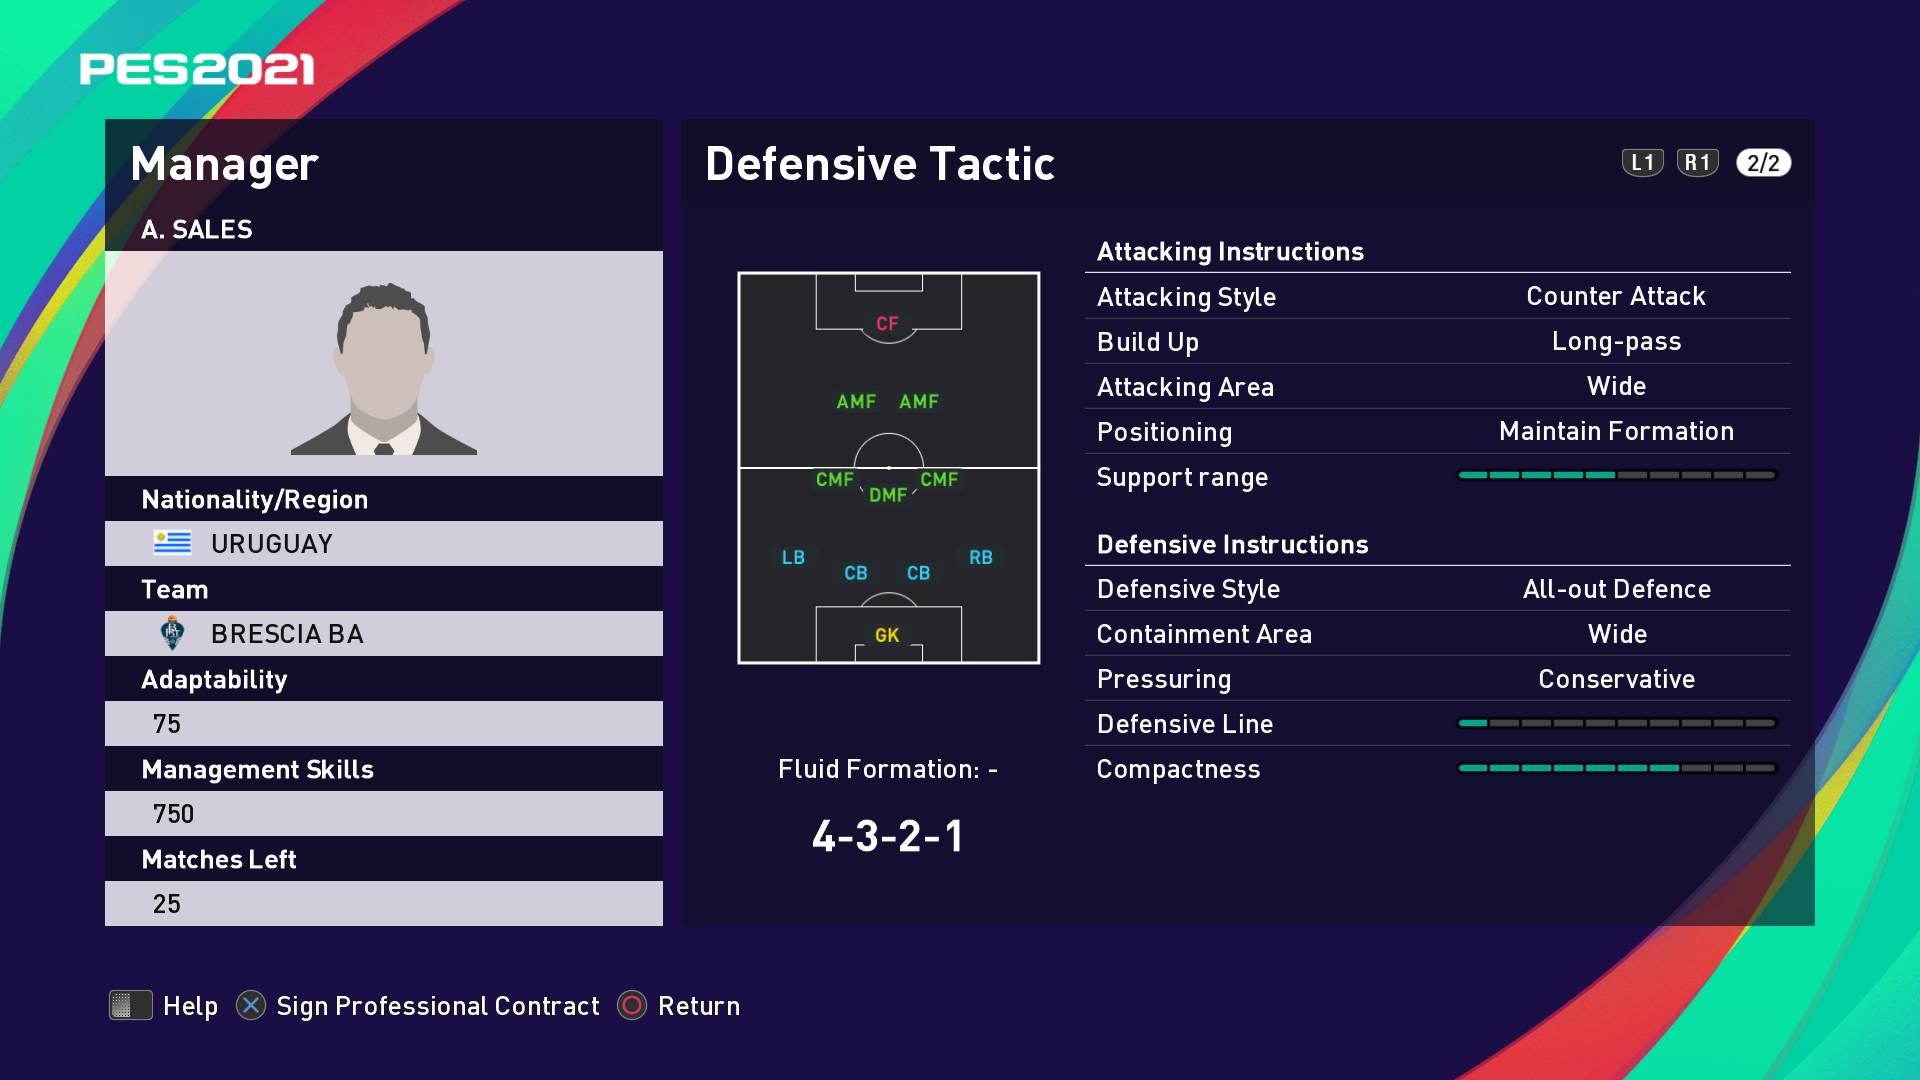 A. Sales (Diego López) Defensive Tactic in PES 2021 myClub